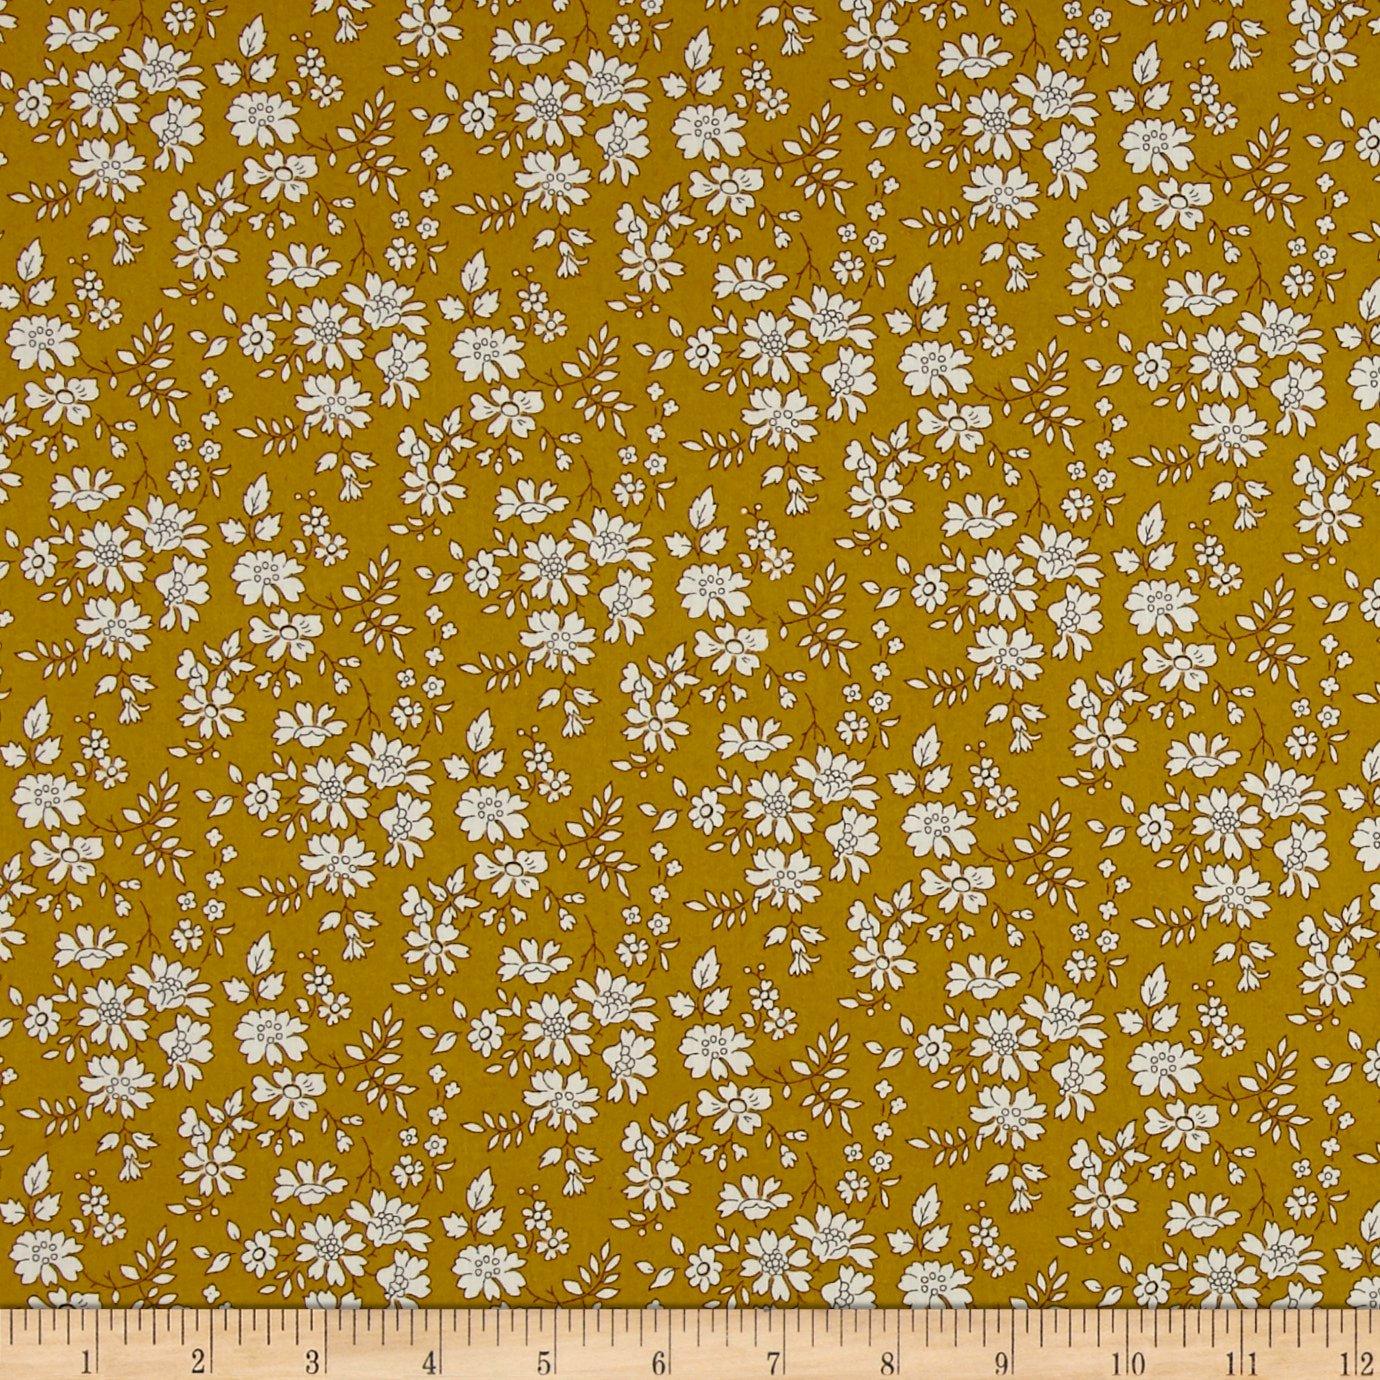 Liberty Fabrics Tana Lawn Capel Mustard Fabric by the Yard